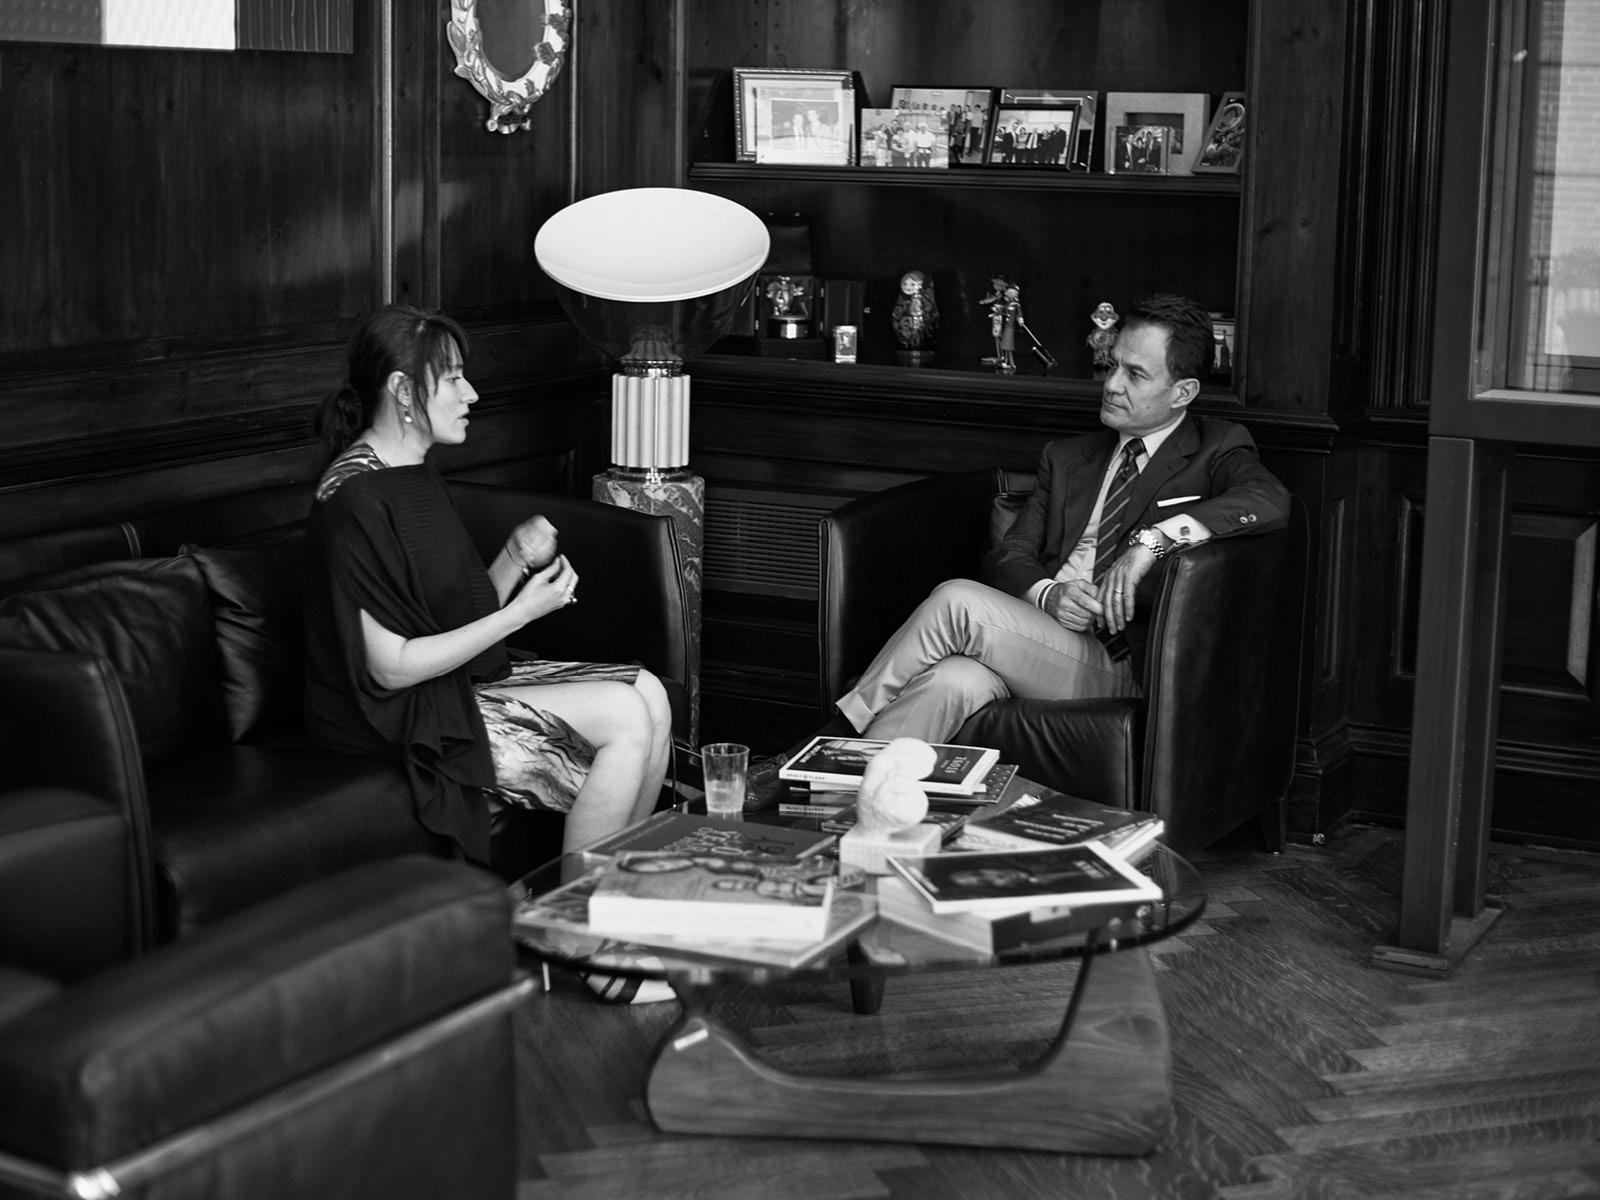 Yelena Deyneko with Maurizio Forte